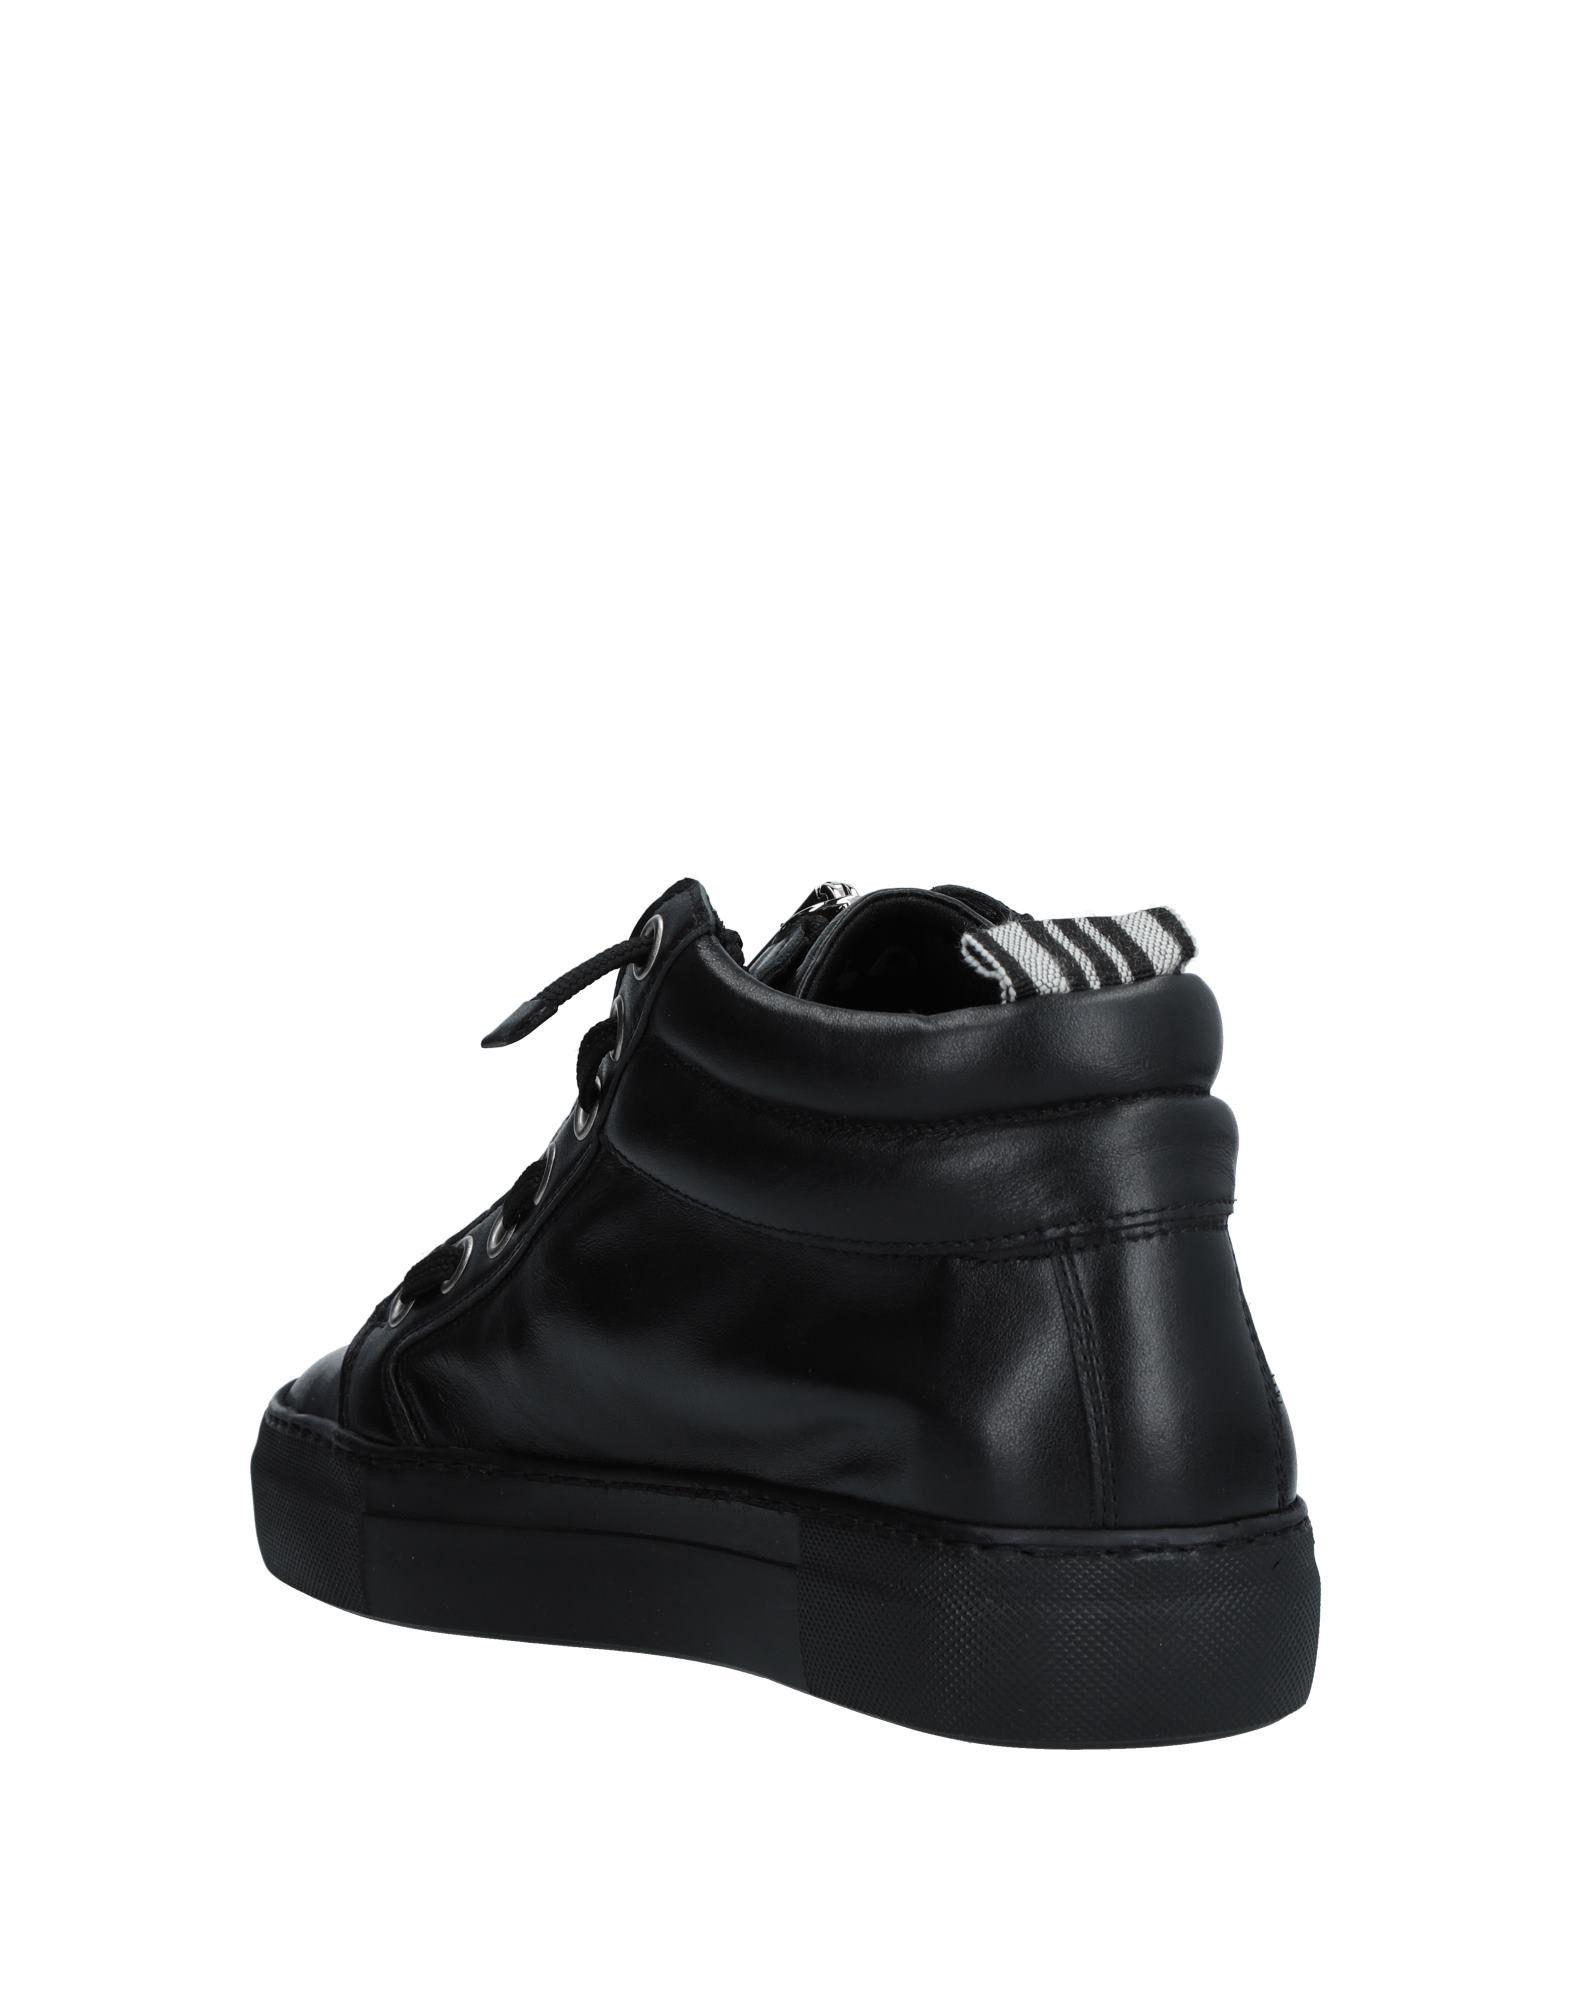 Stilvolle Sneakers billige Schuhe Baldinini Trend Sneakers Stilvolle Damen  11540372WD 4e95fc